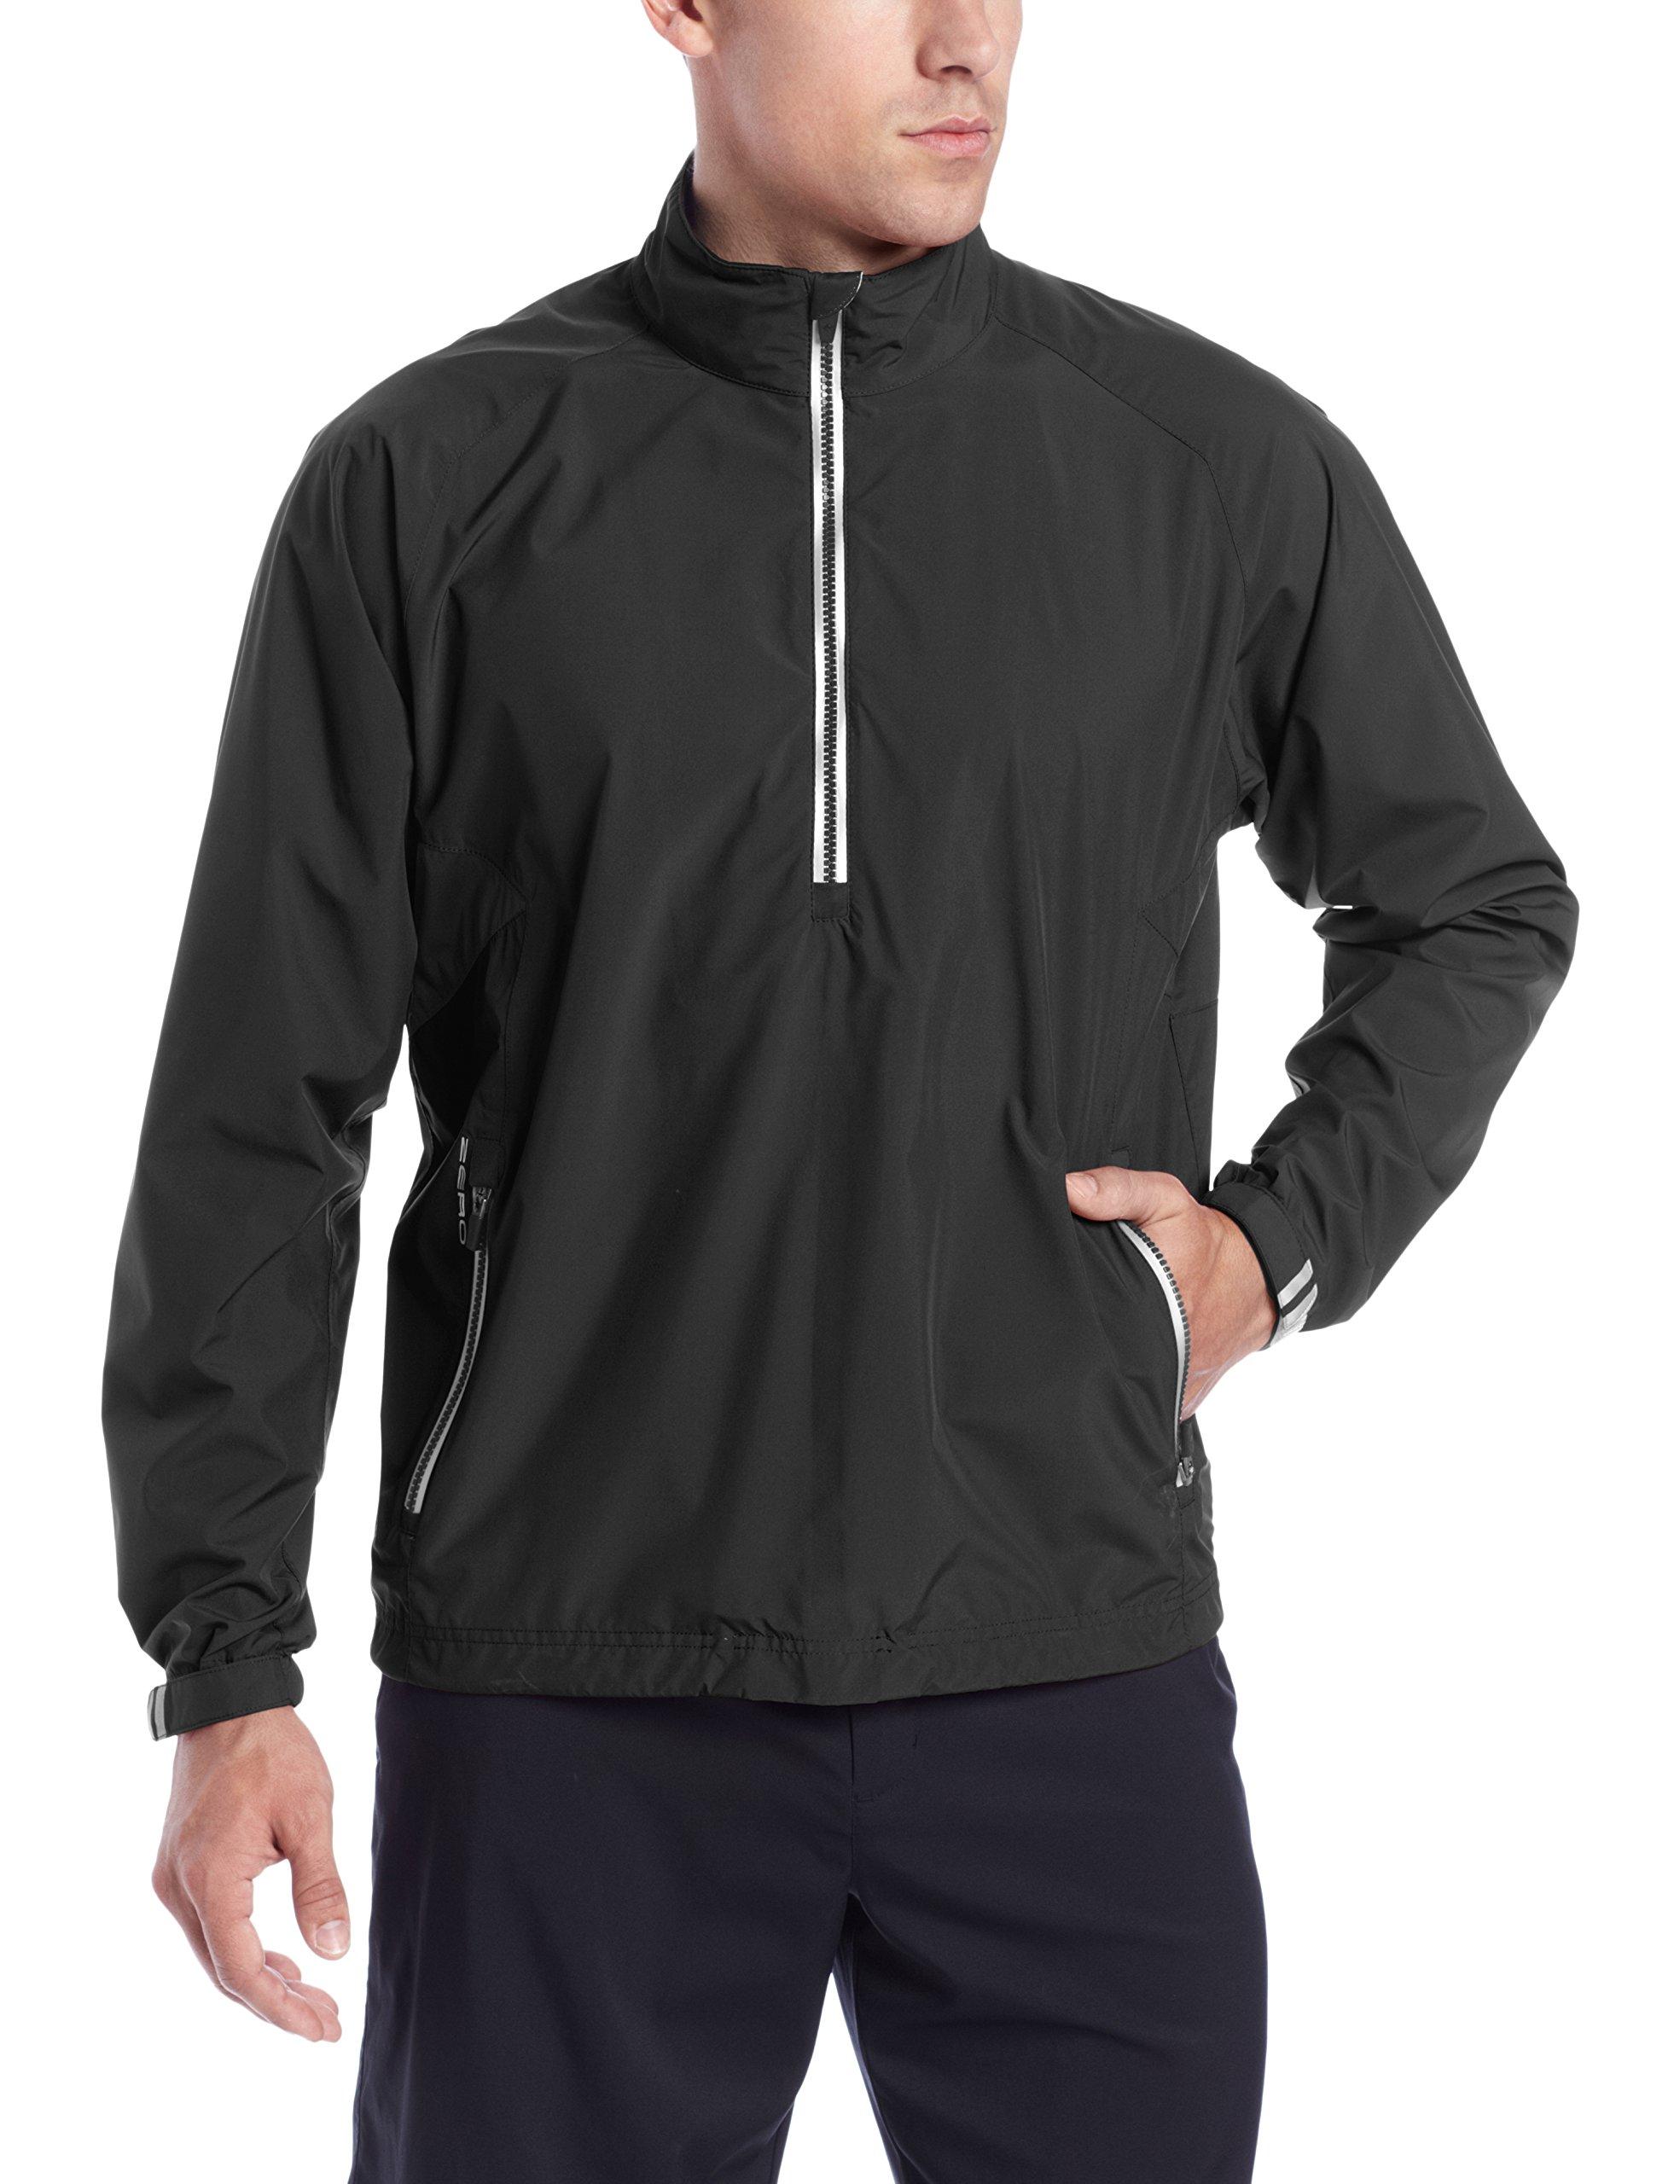 Zero Restriction Men's Power Torque 1/4 Zip Packable Rain Jacket, Black/Black, Large